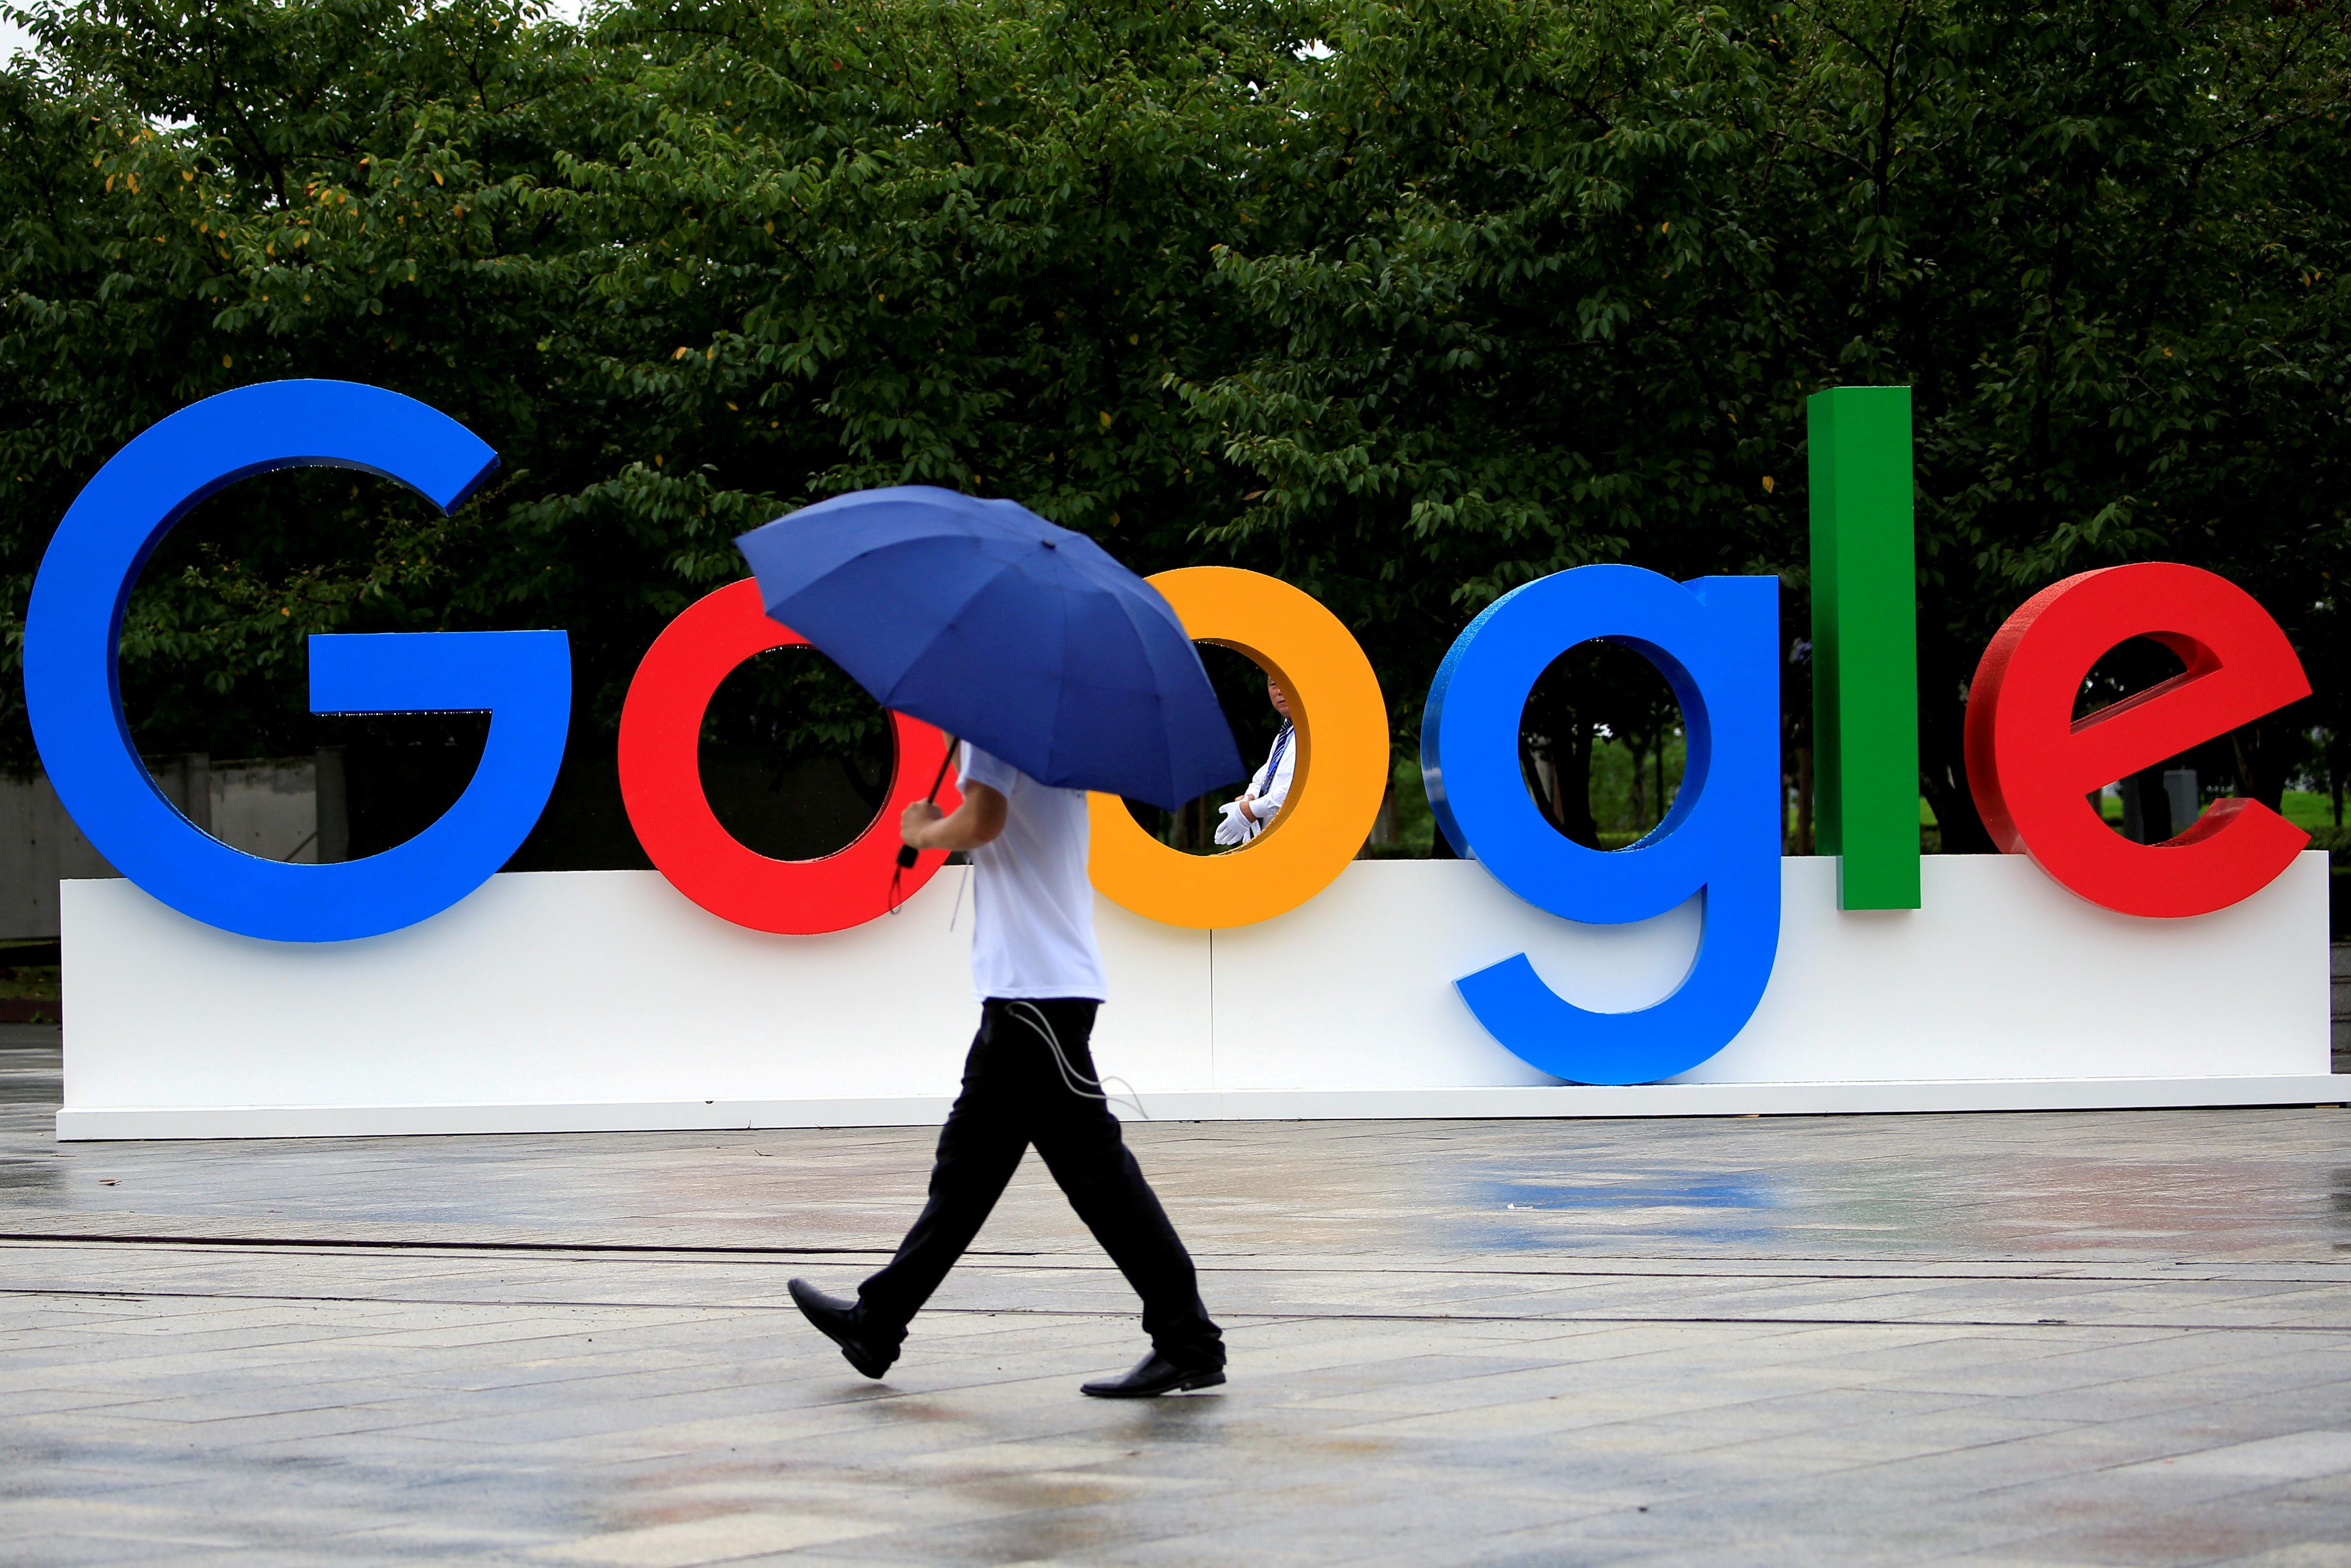 Exclusive: U.S. states plan Google antitrust meeting next month in...